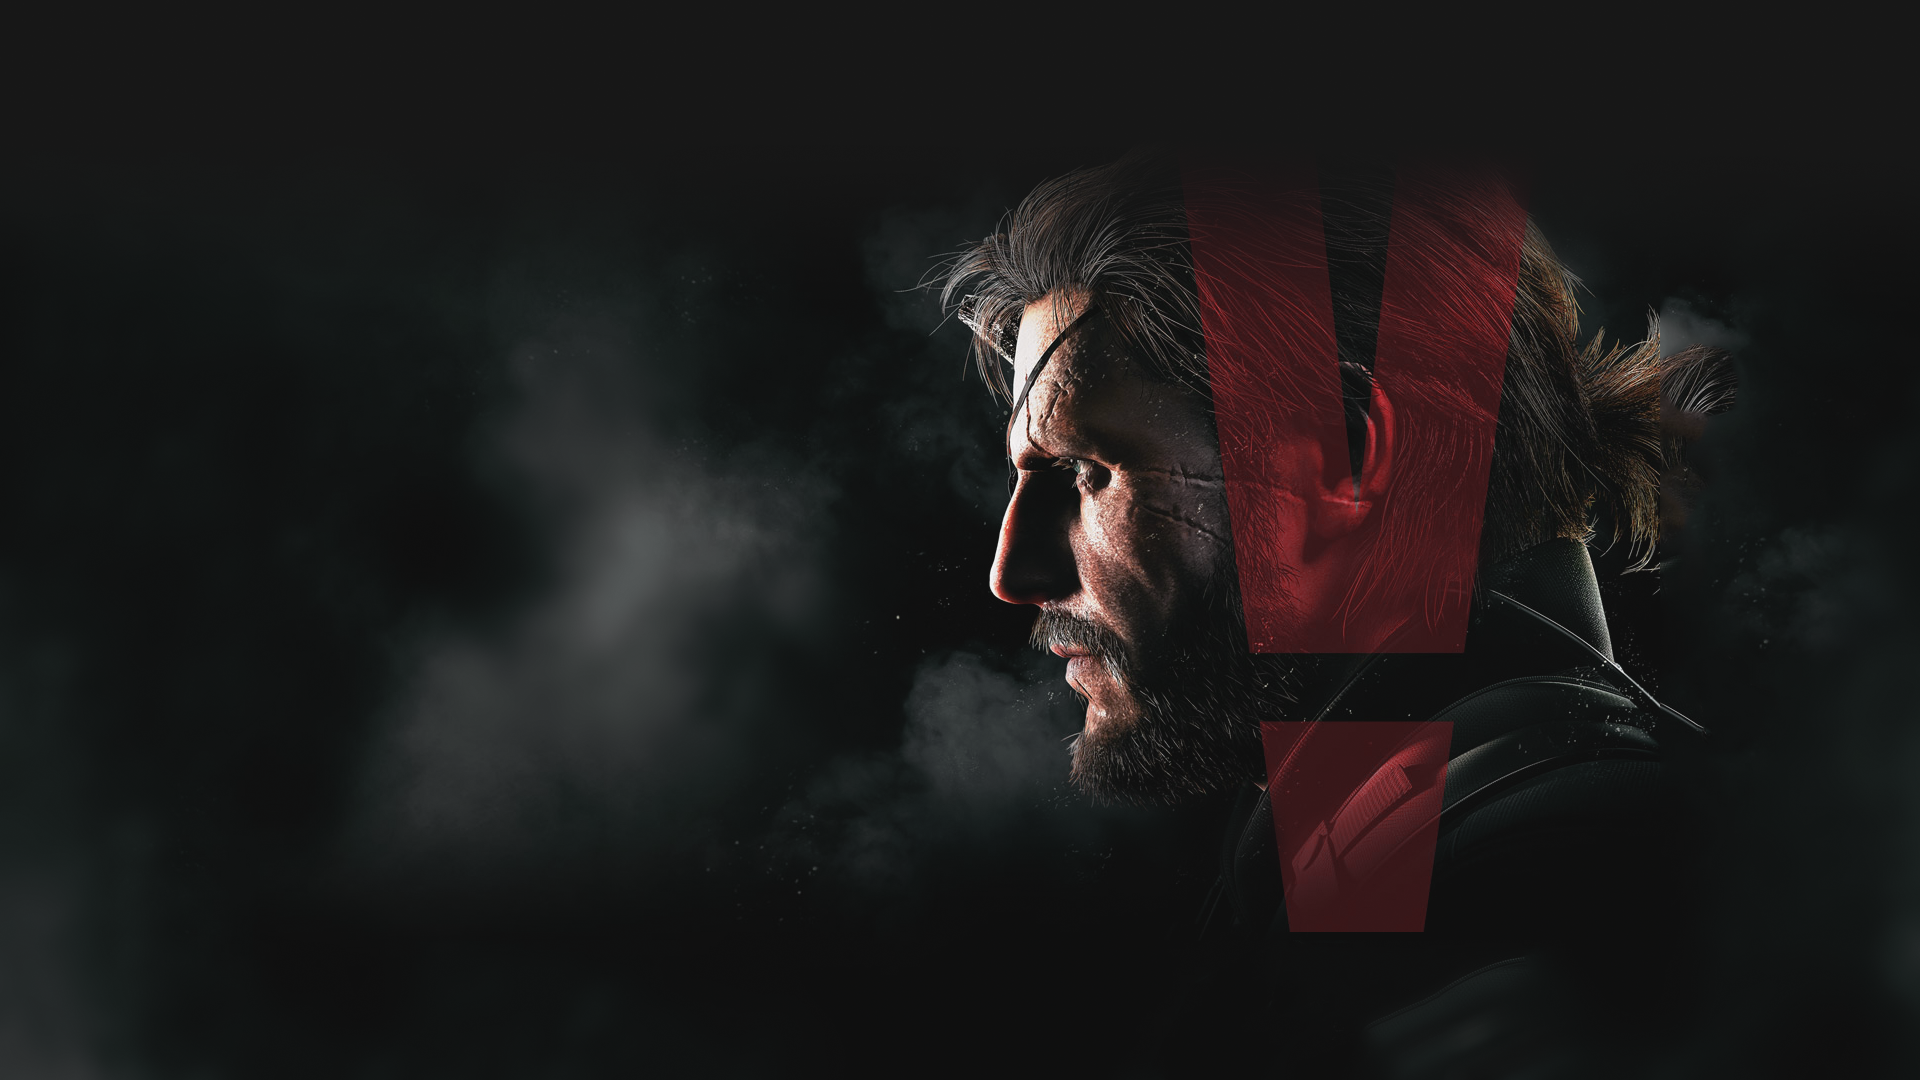 Metal Gear Solid V The Phantom Pain Wallpaper Fondo De